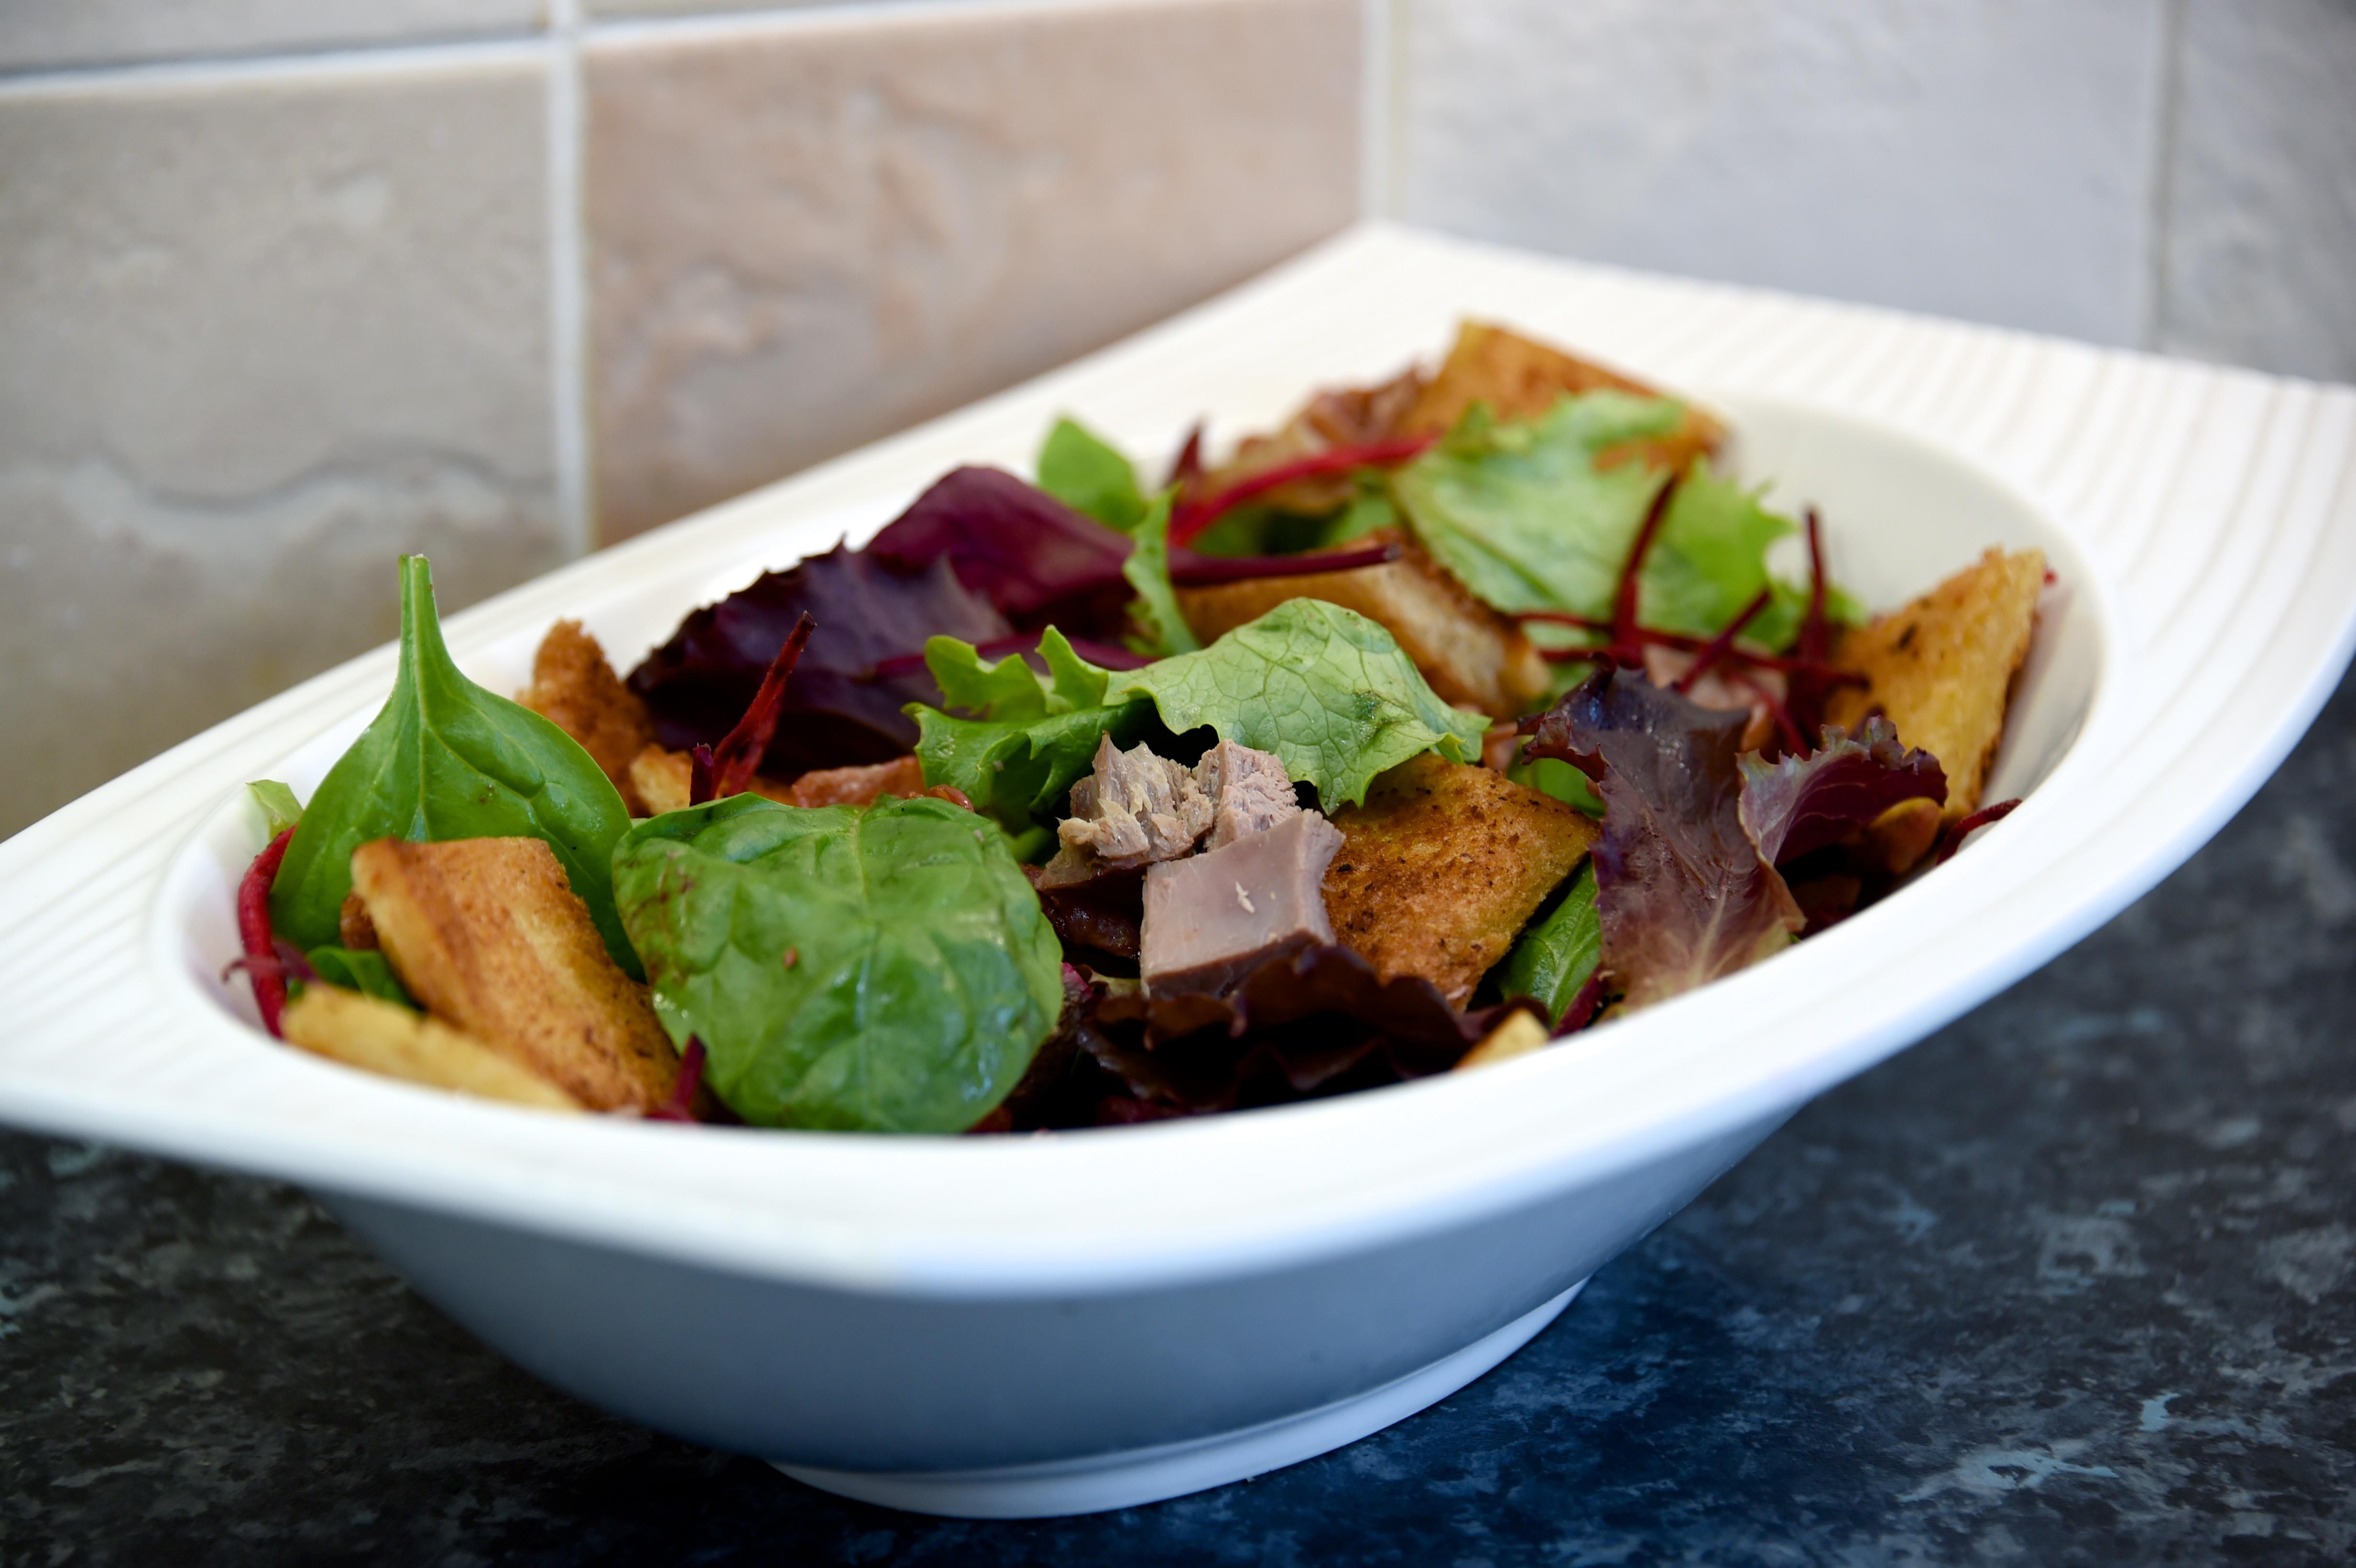 Warm Grouse Salad